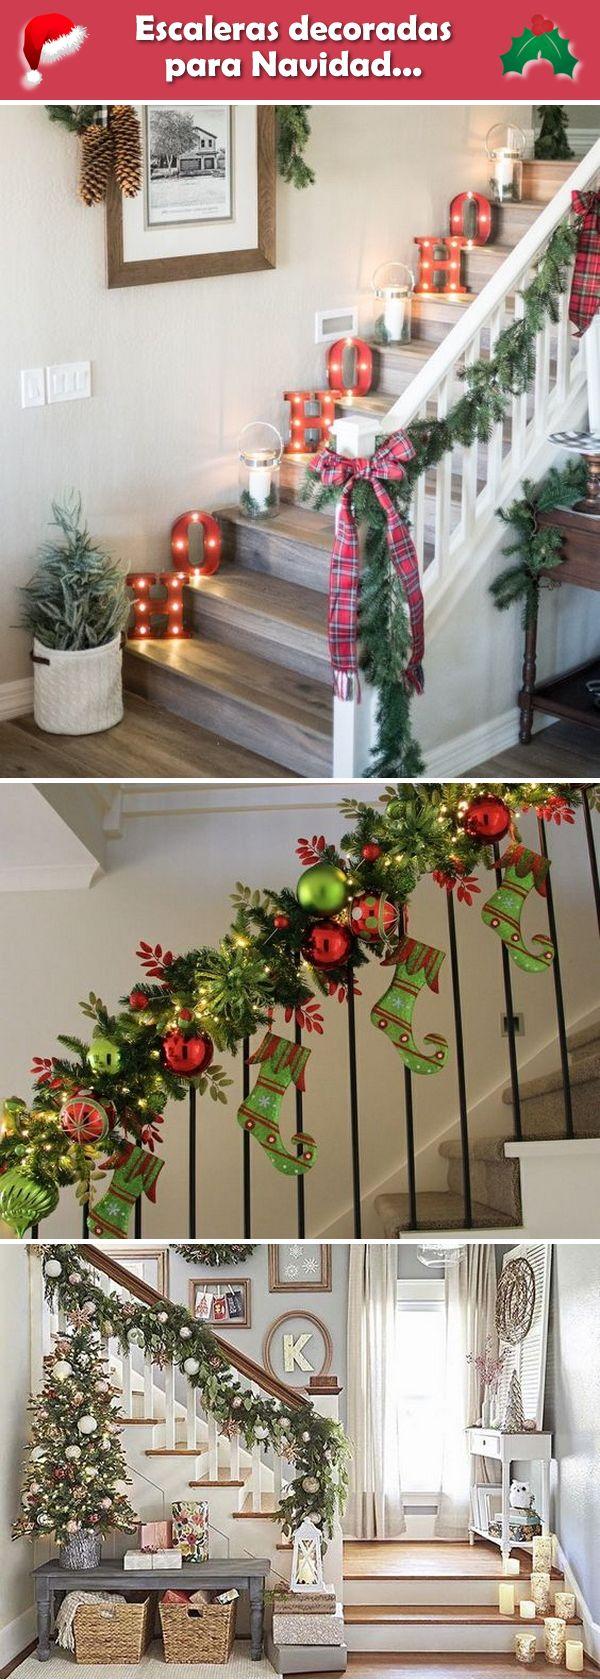 M s de 25 ideas incre bles sobre decoraciones para rboles for Como decorar gradas